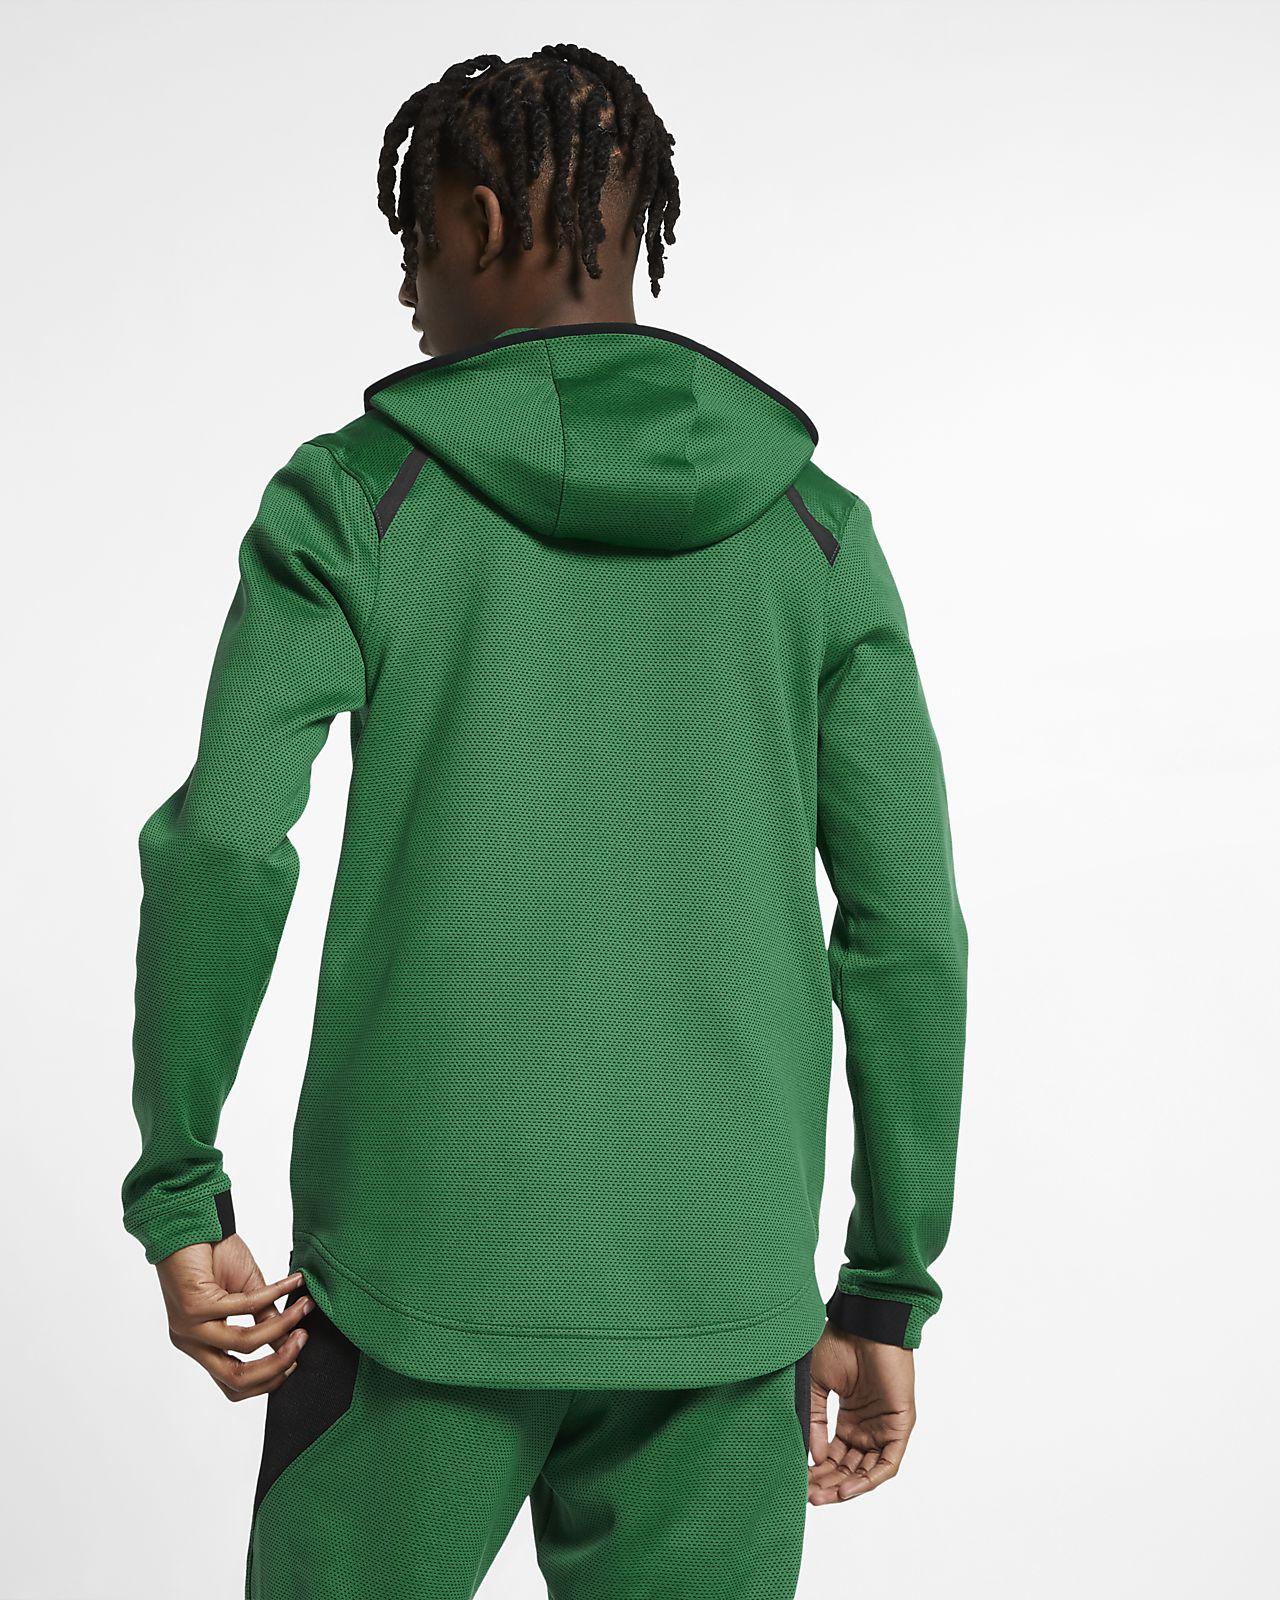 95ee74d02339 Boston Celtics Nike Therma Flex Showtime Men s NBA Hoodie. Nike.com